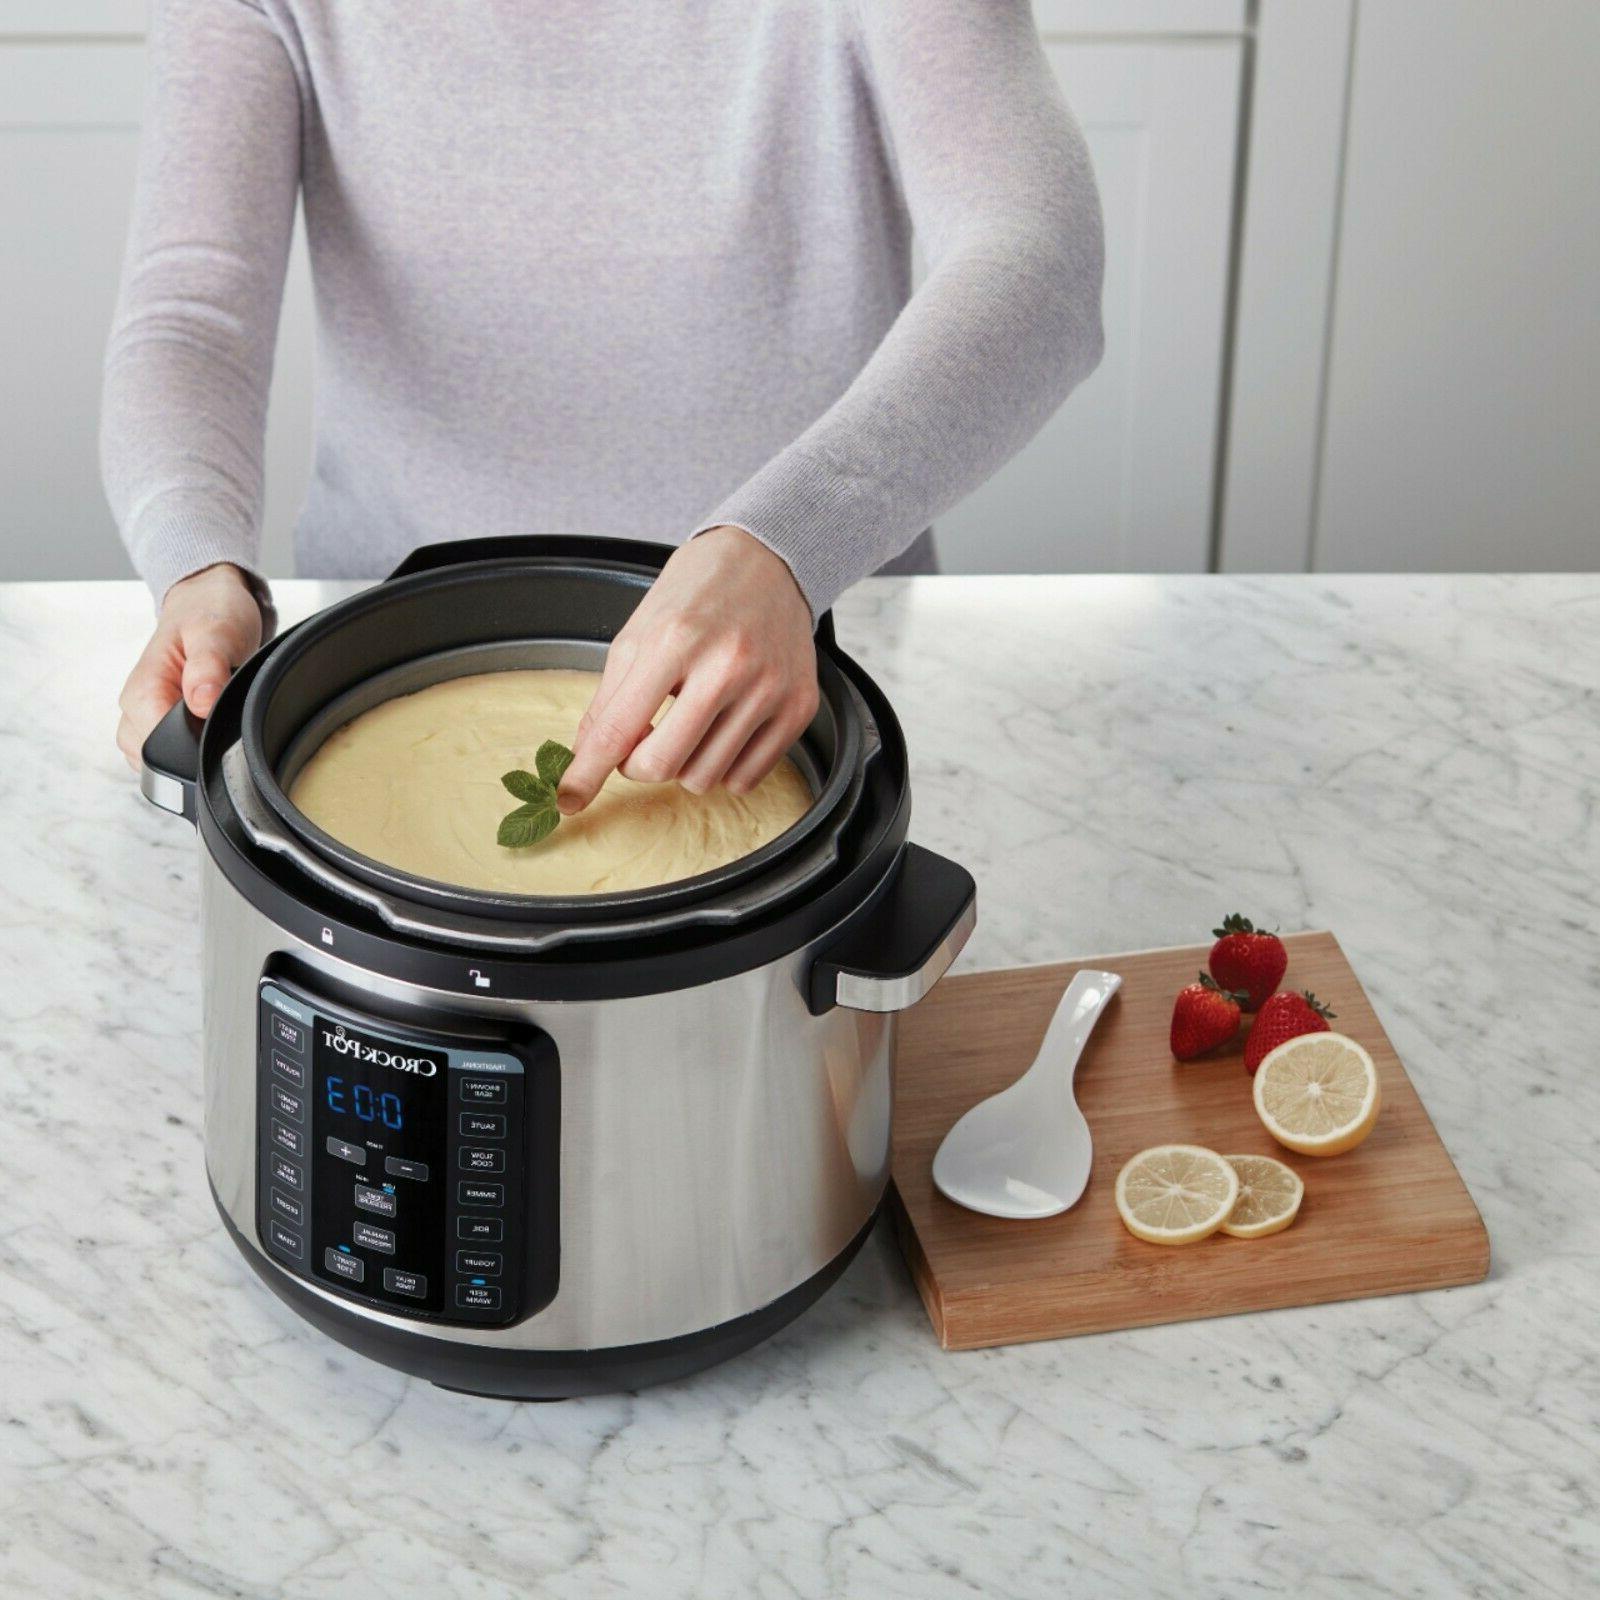 Crock-Pot 8-Quart Multi-Cooker Steel